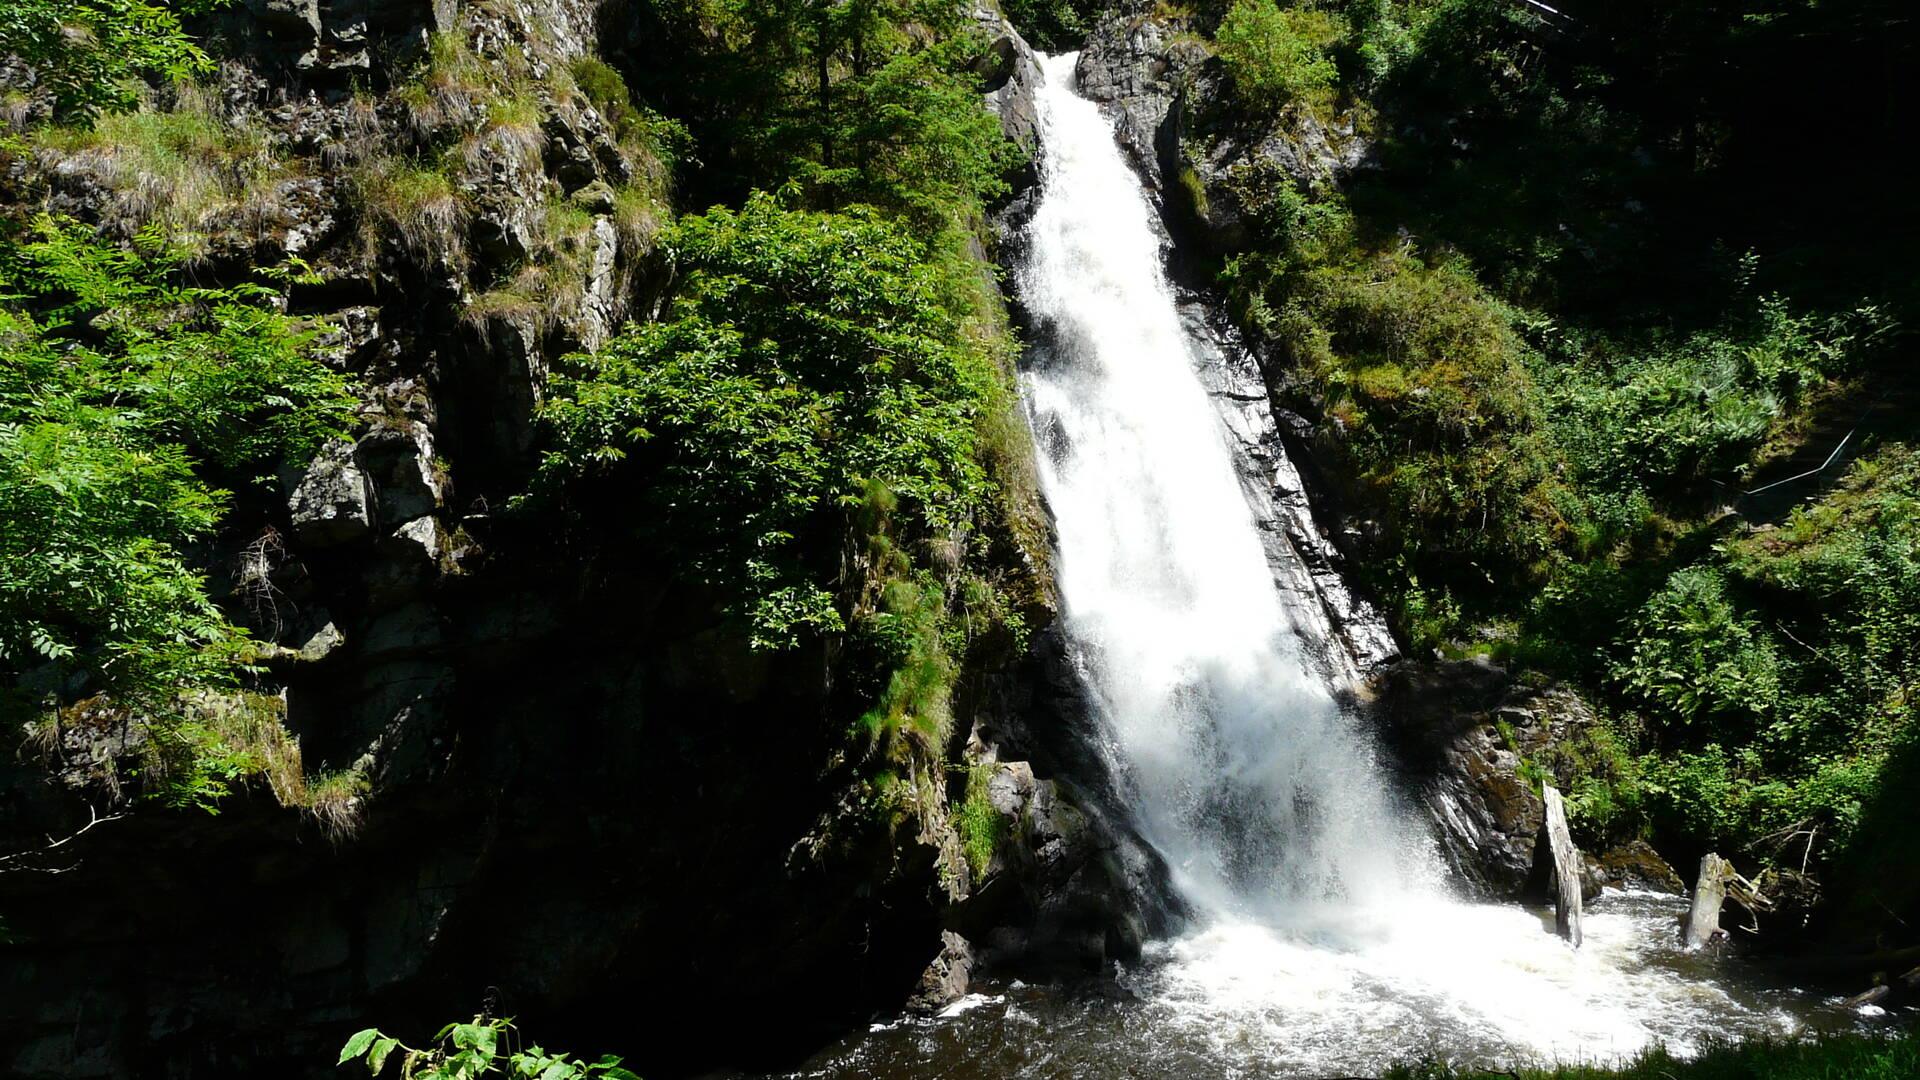 The cascades of Gimel